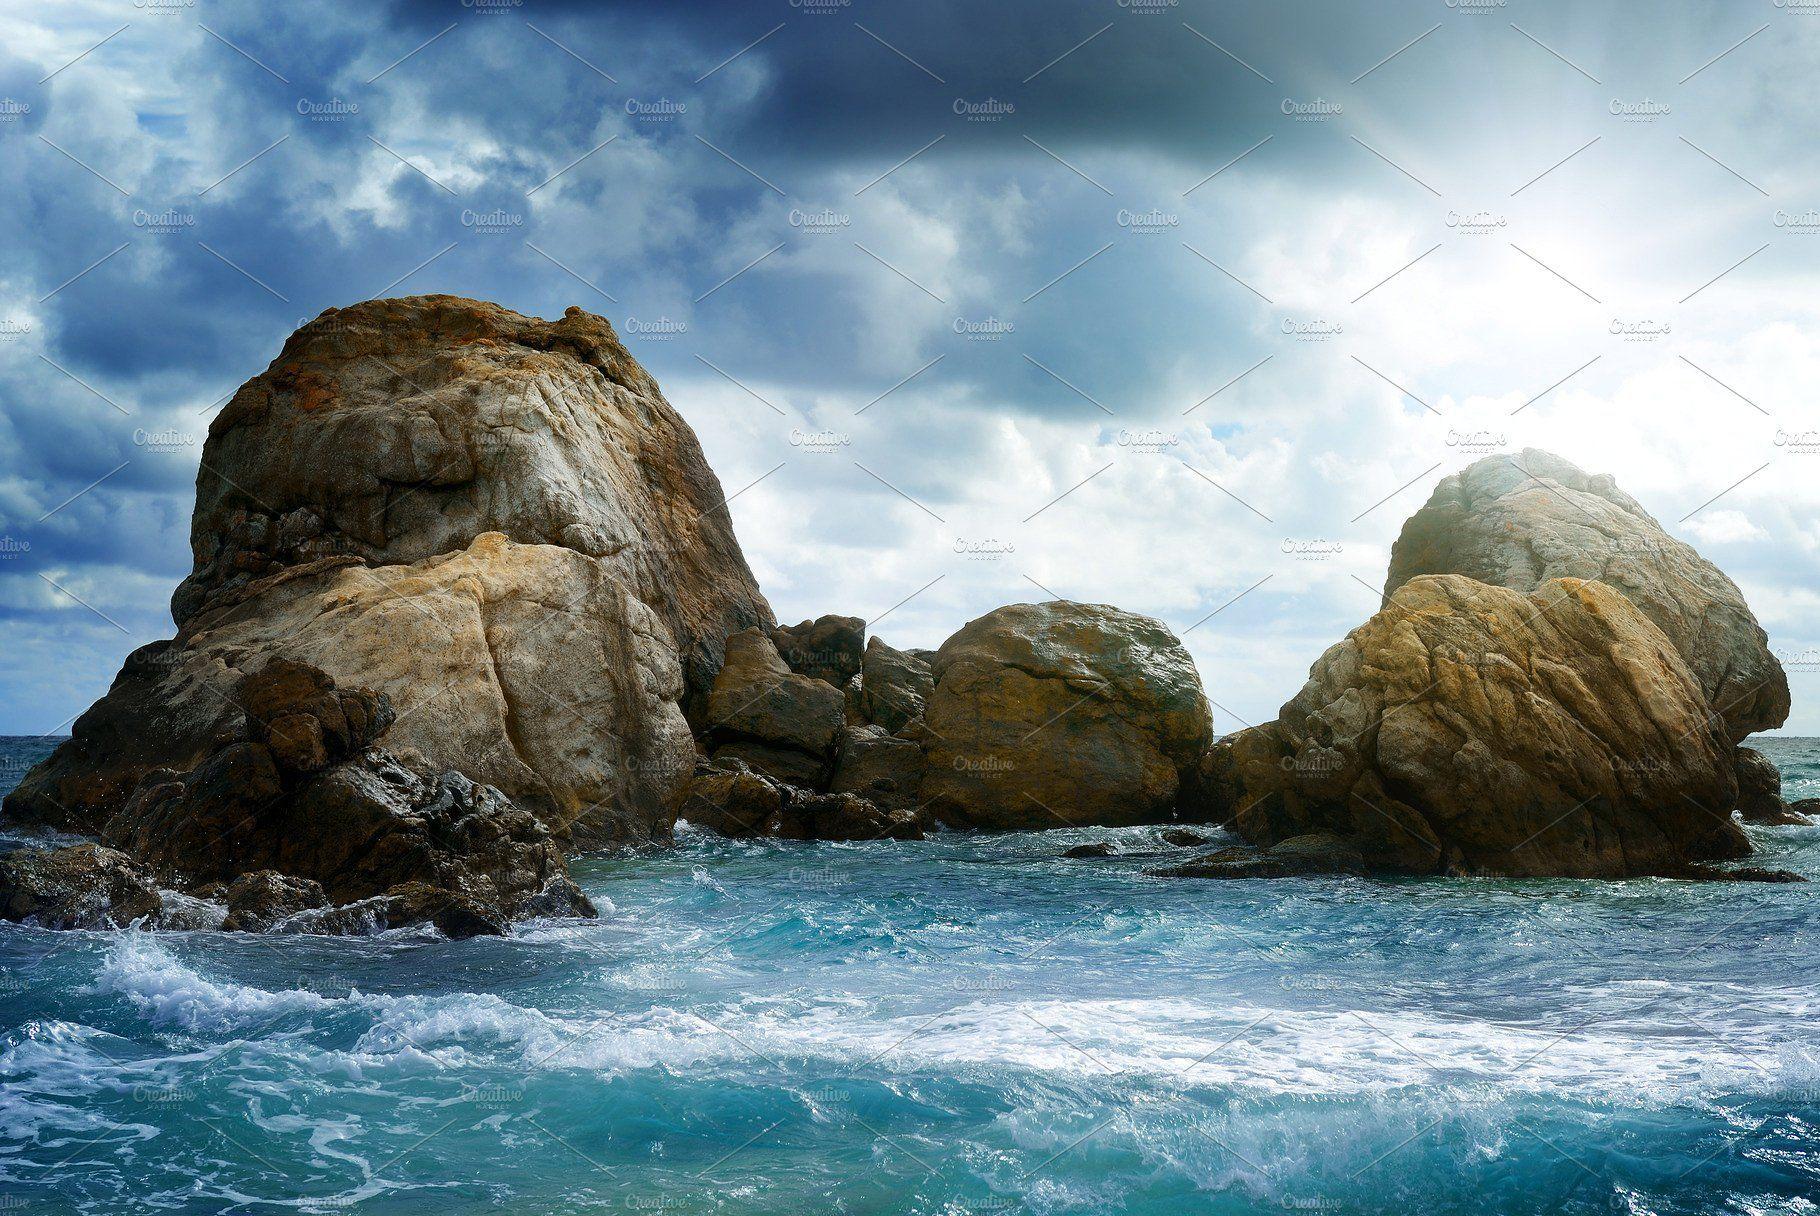 Sea Landscape With Rock By Serg64 On Creativemarket Landscapewithrocks Landscaping With Rocks Landscape Landscape Design